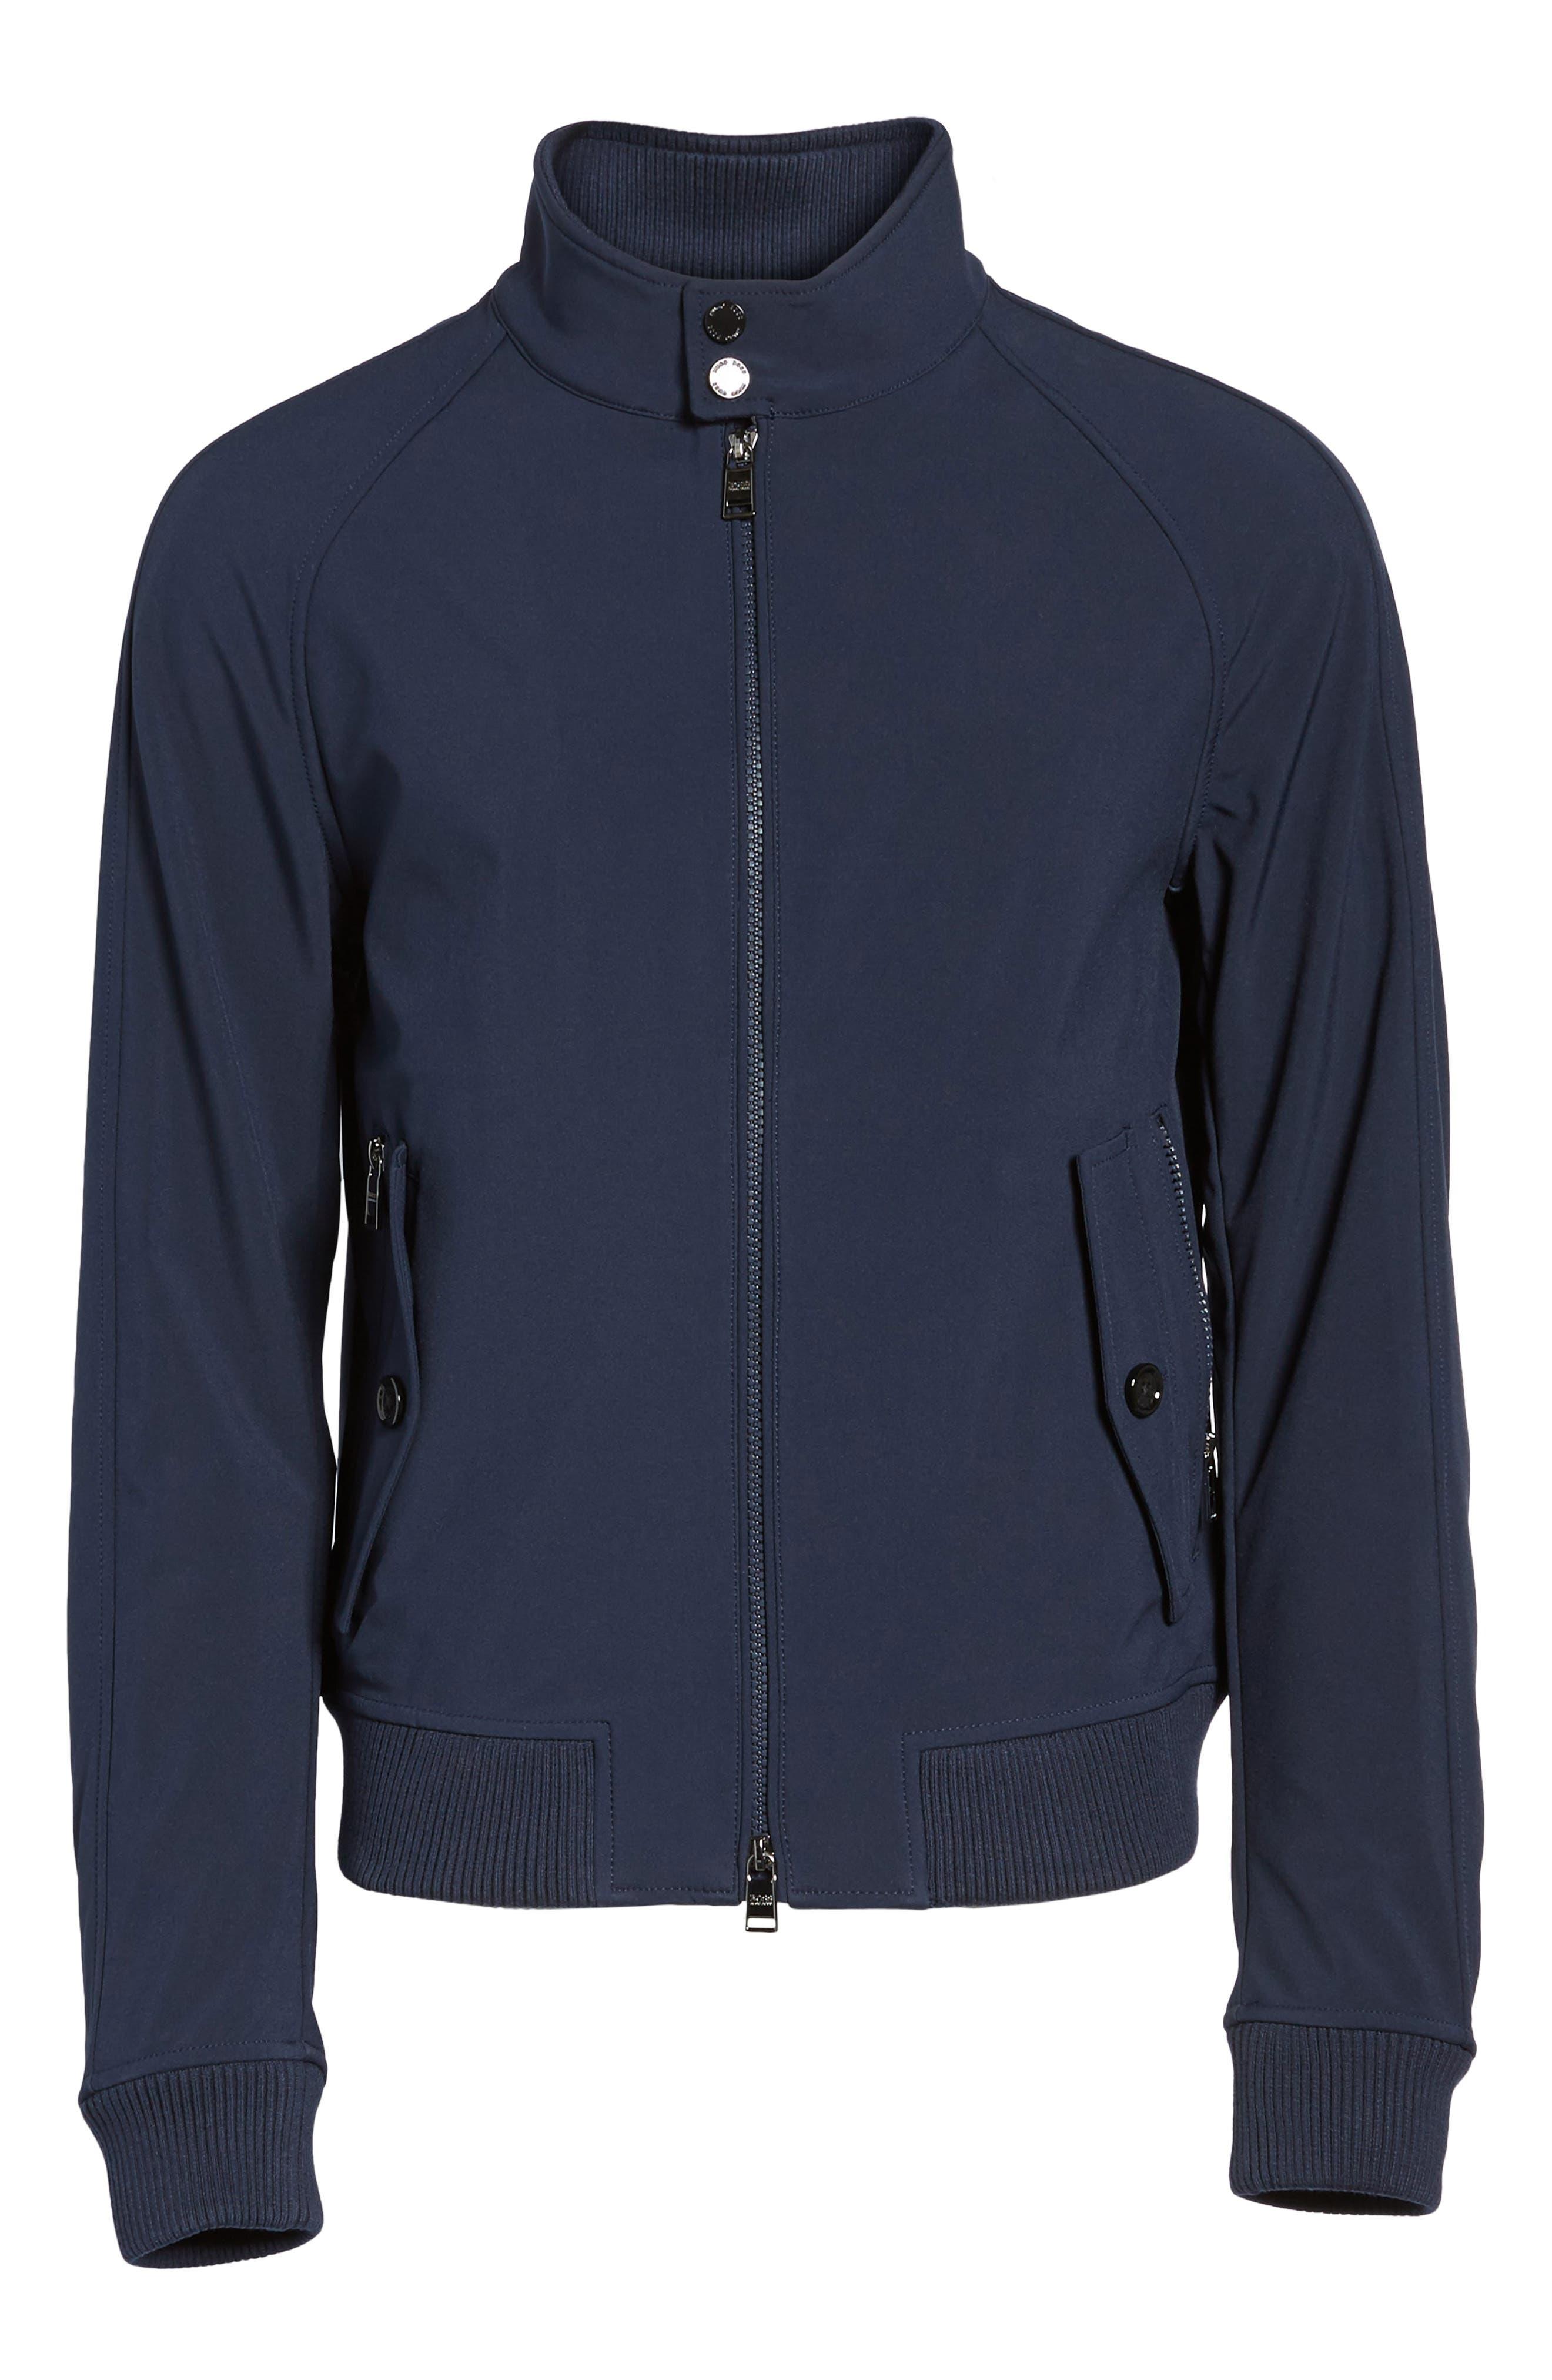 Corva Technical Jacket,                             Alternate thumbnail 5, color,                             410